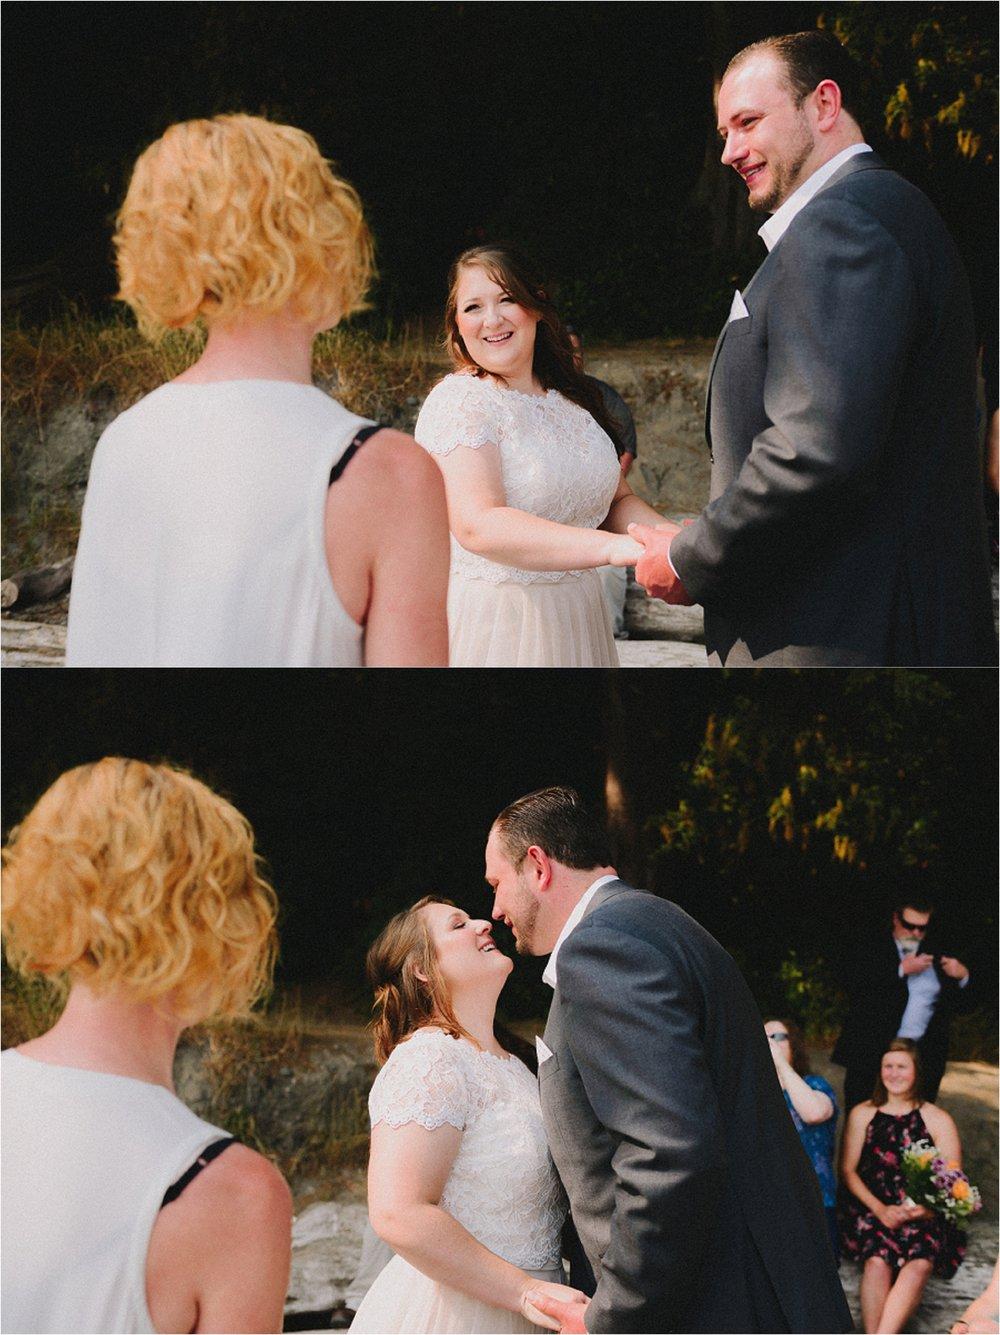 owen-beach-priest-point-park-tacoma-washington-elopement-jannicka-mayte-anchorage-alaska-wedding-elopement-photographer (43).jpg